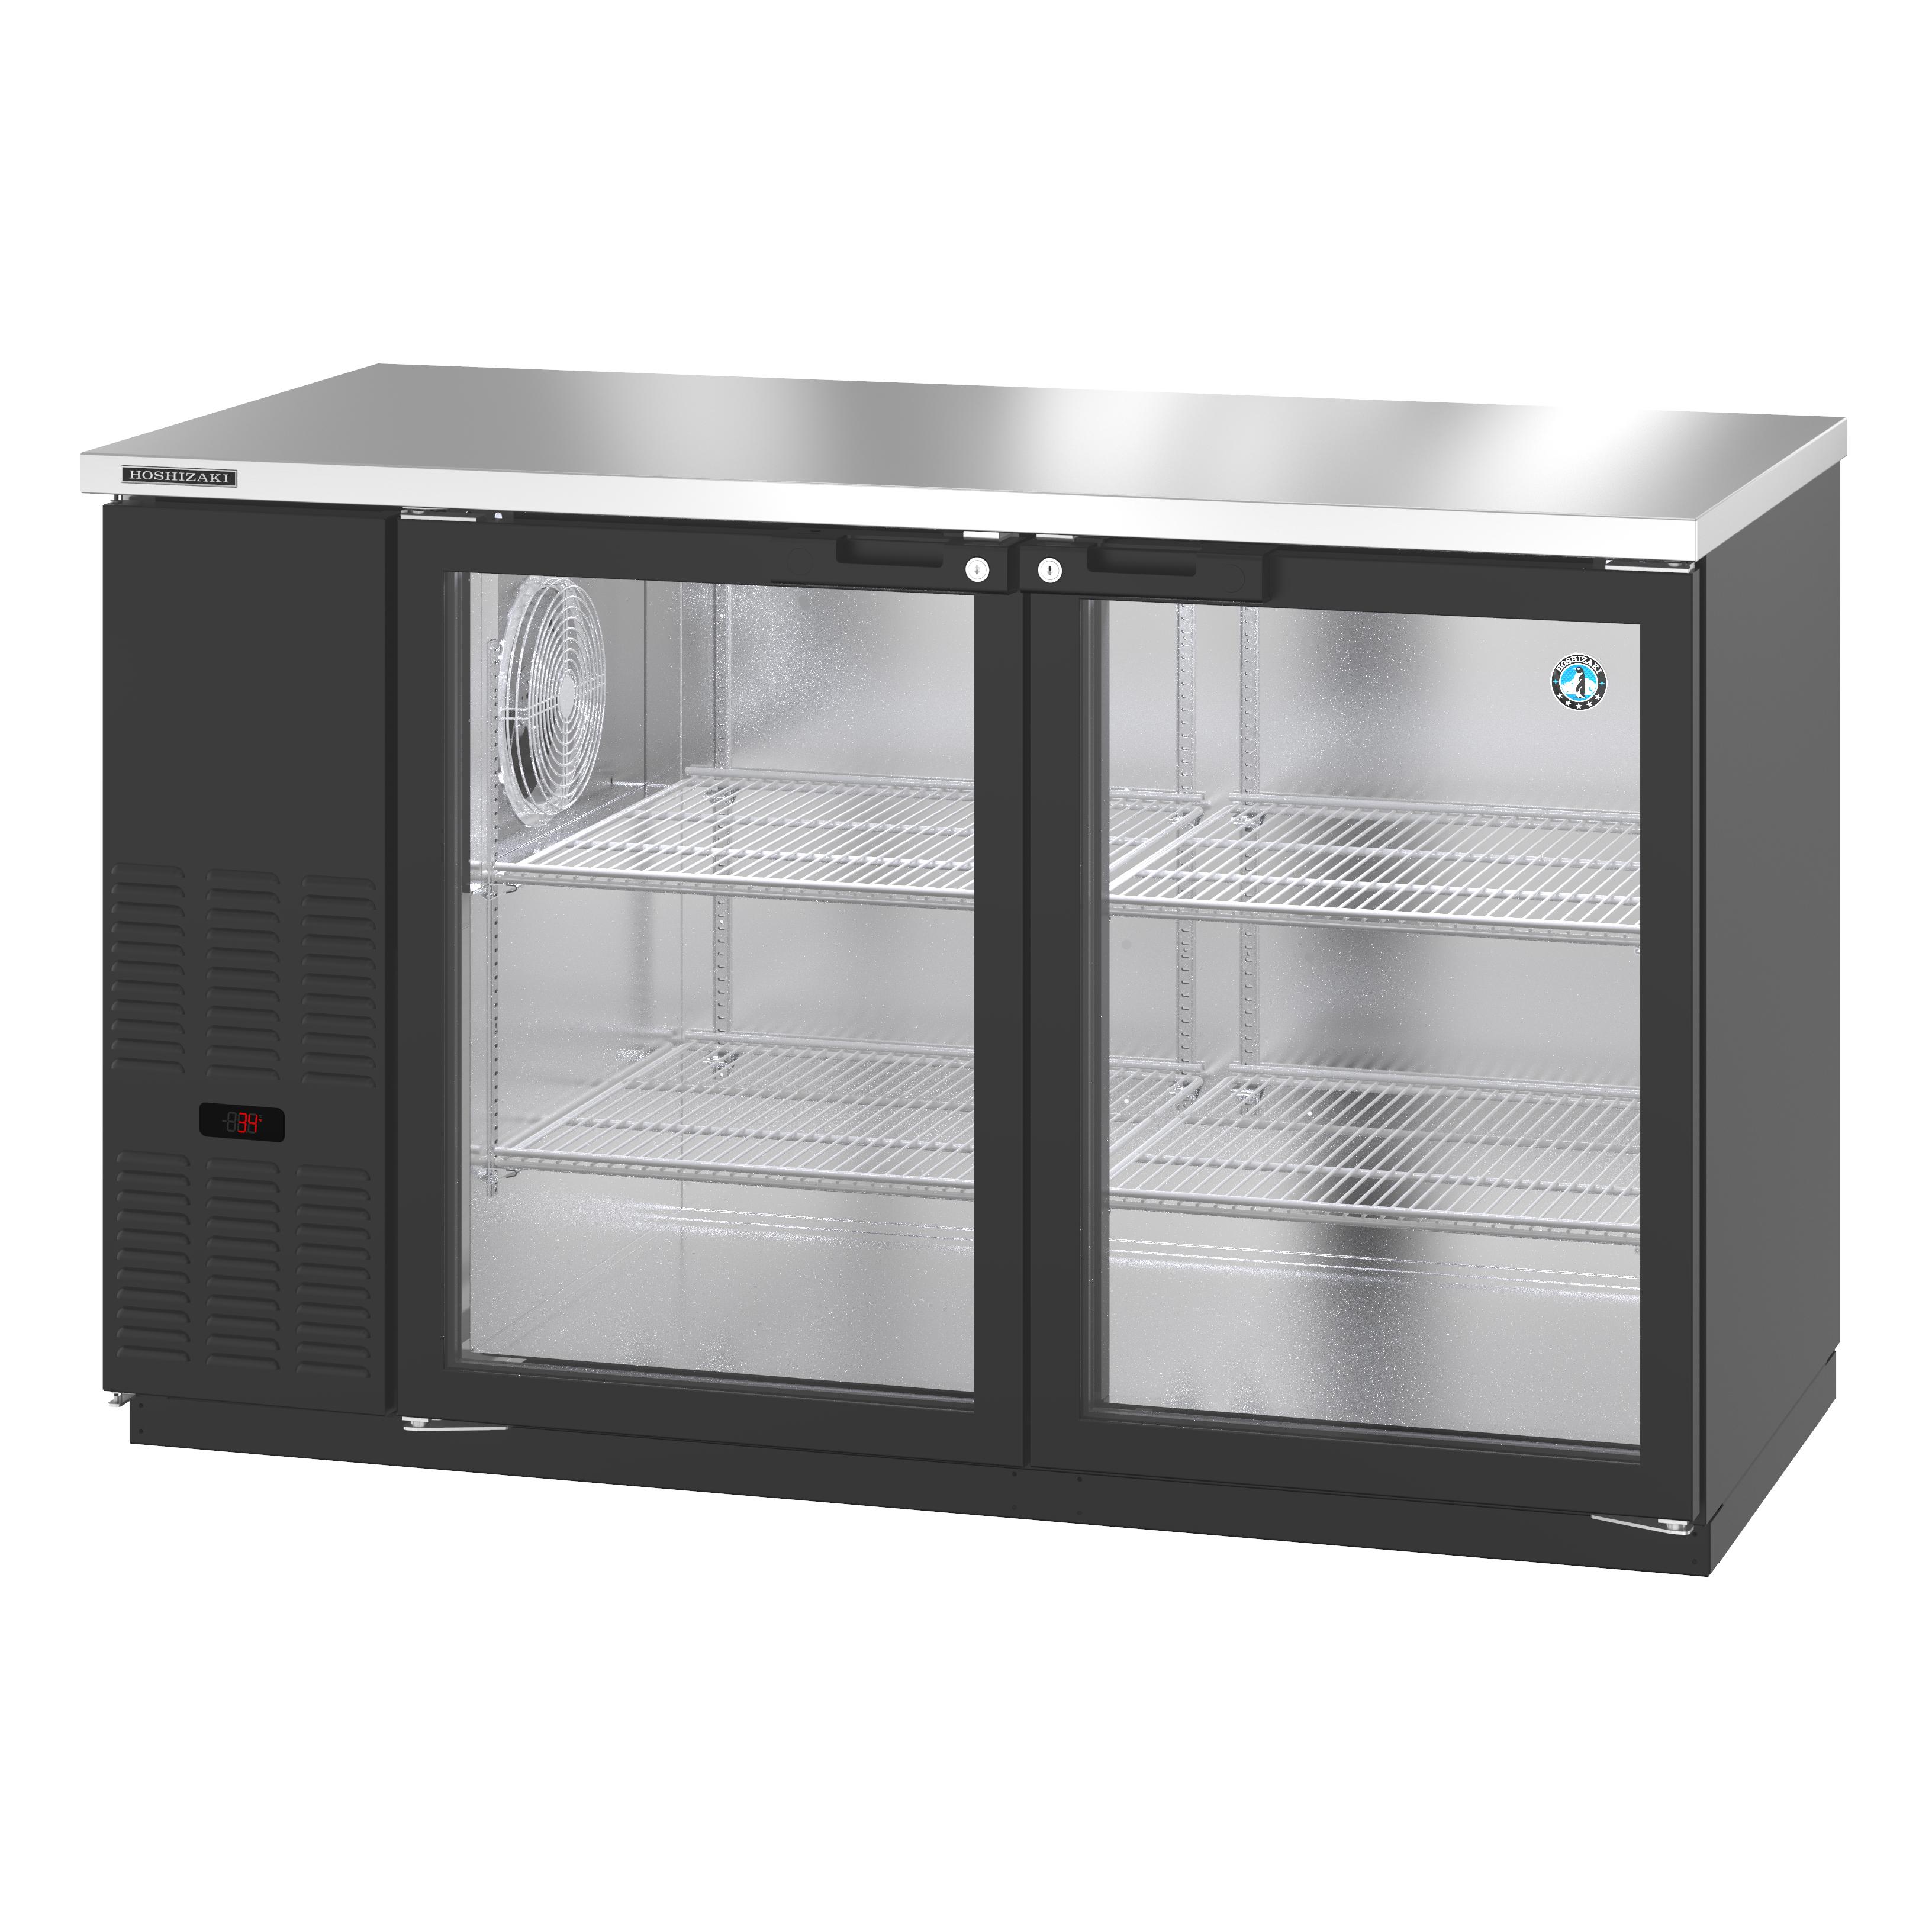 Hoshizaki BB59-G underbar equipment/refrigeration